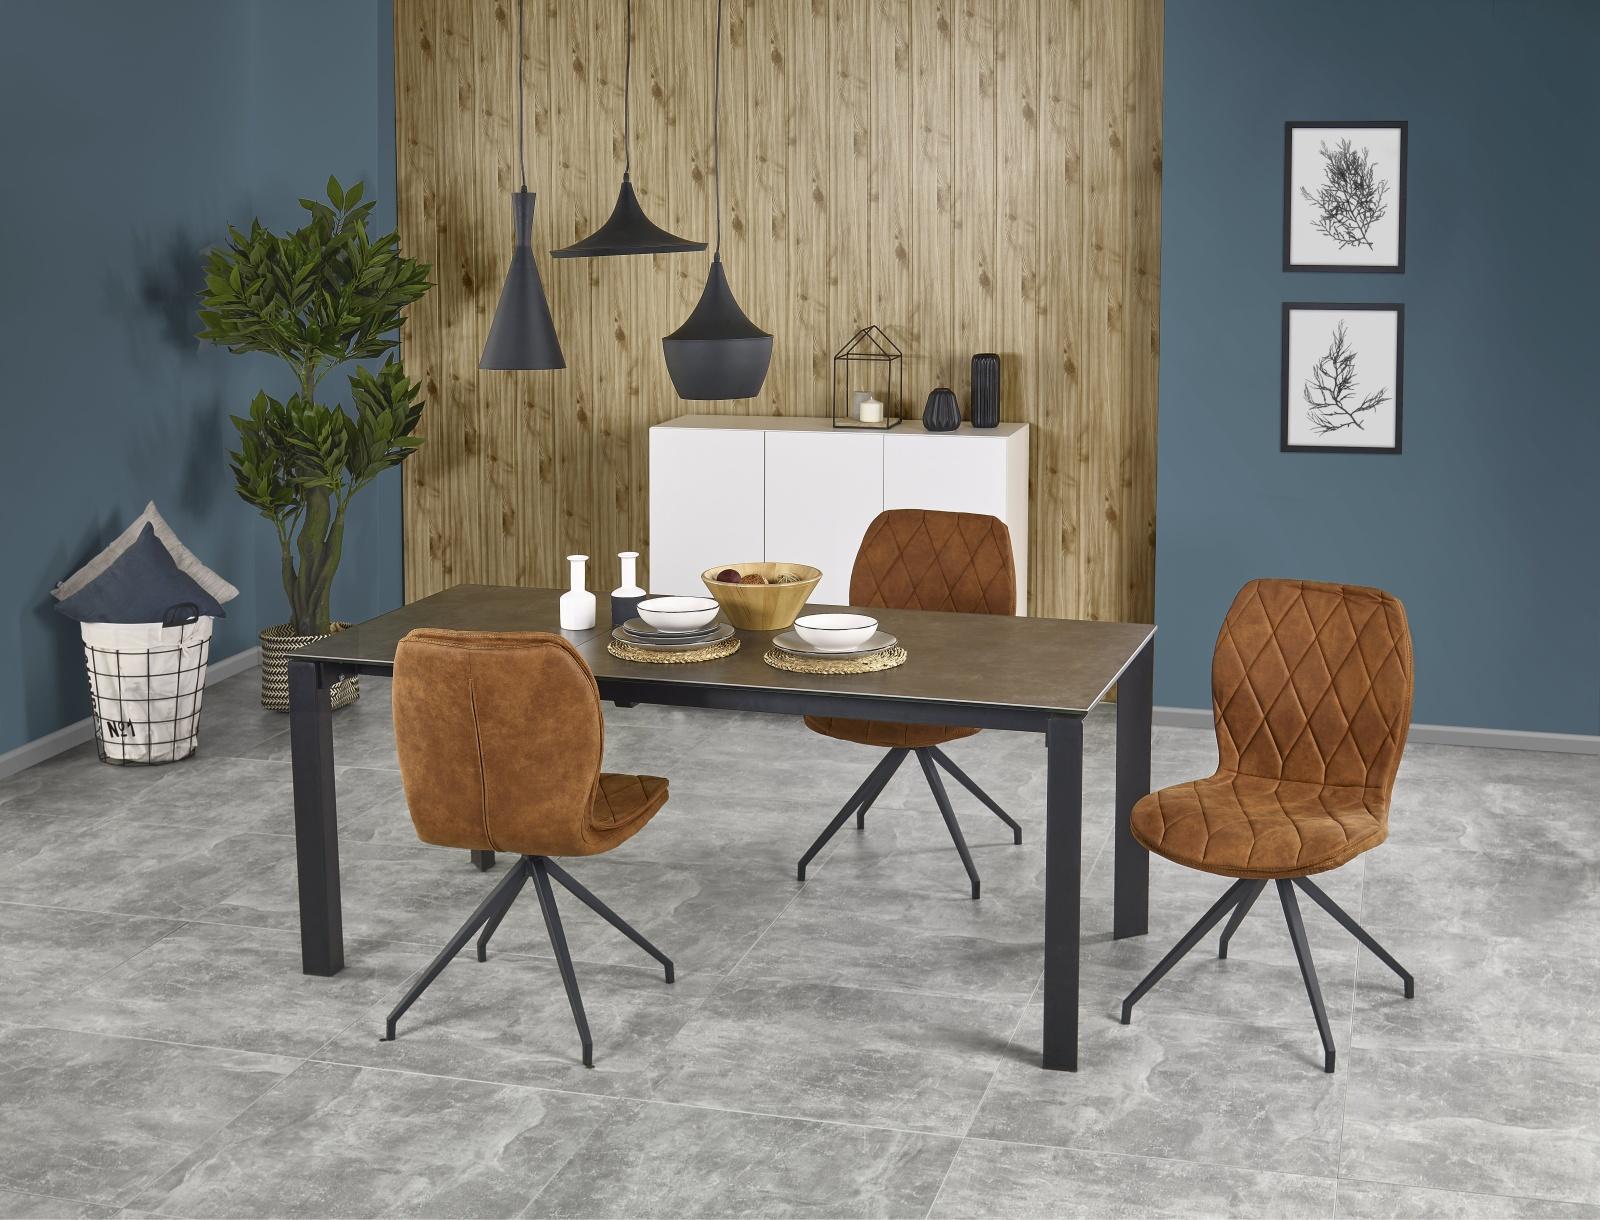 Halmar Jídelní stůl rozkládací HORIZON 120/180x85 cm, šedý